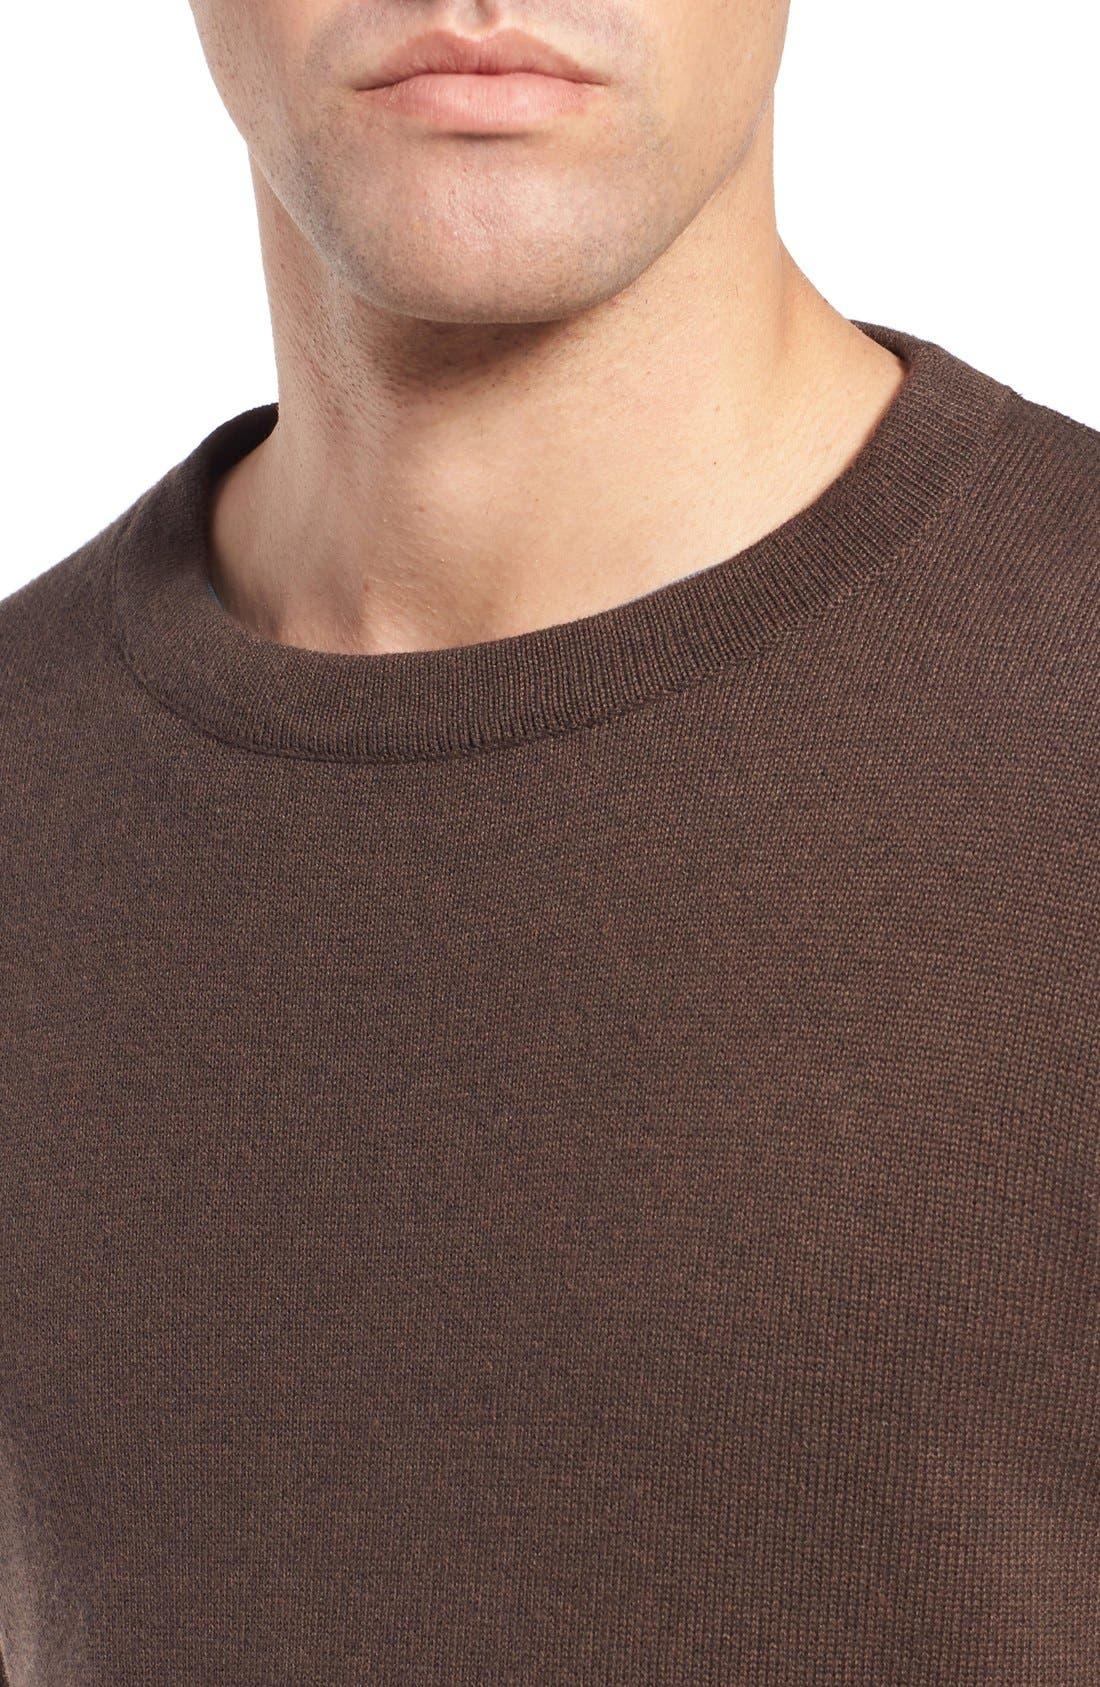 'San Francisco' Crewneck Sweater,                             Alternate thumbnail 4, color,                             245